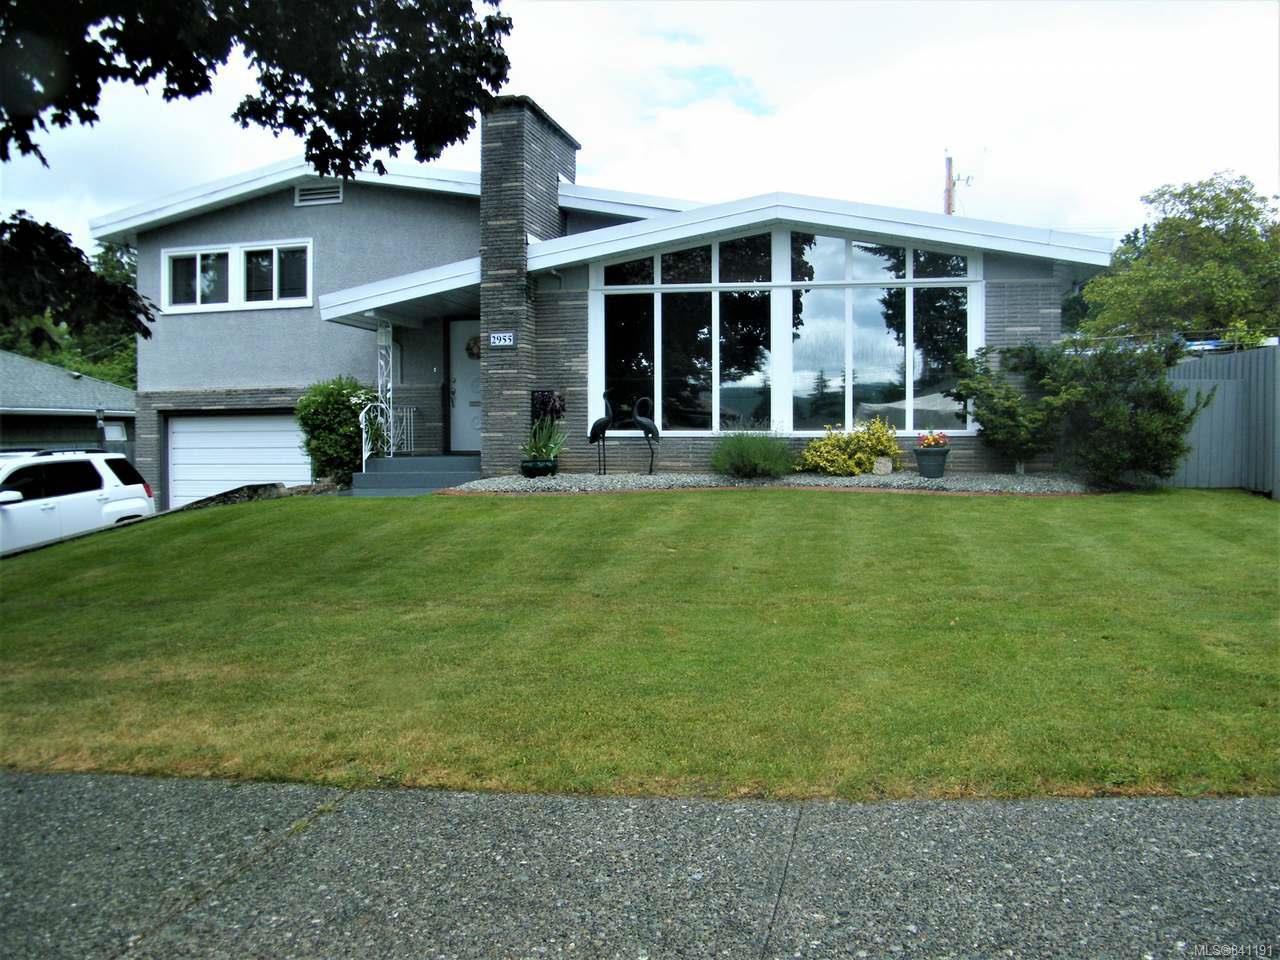 Main Photo: 2955 15th Ave in PORT ALBERNI: PA Port Alberni House for sale (Port Alberni)  : MLS®# 841191